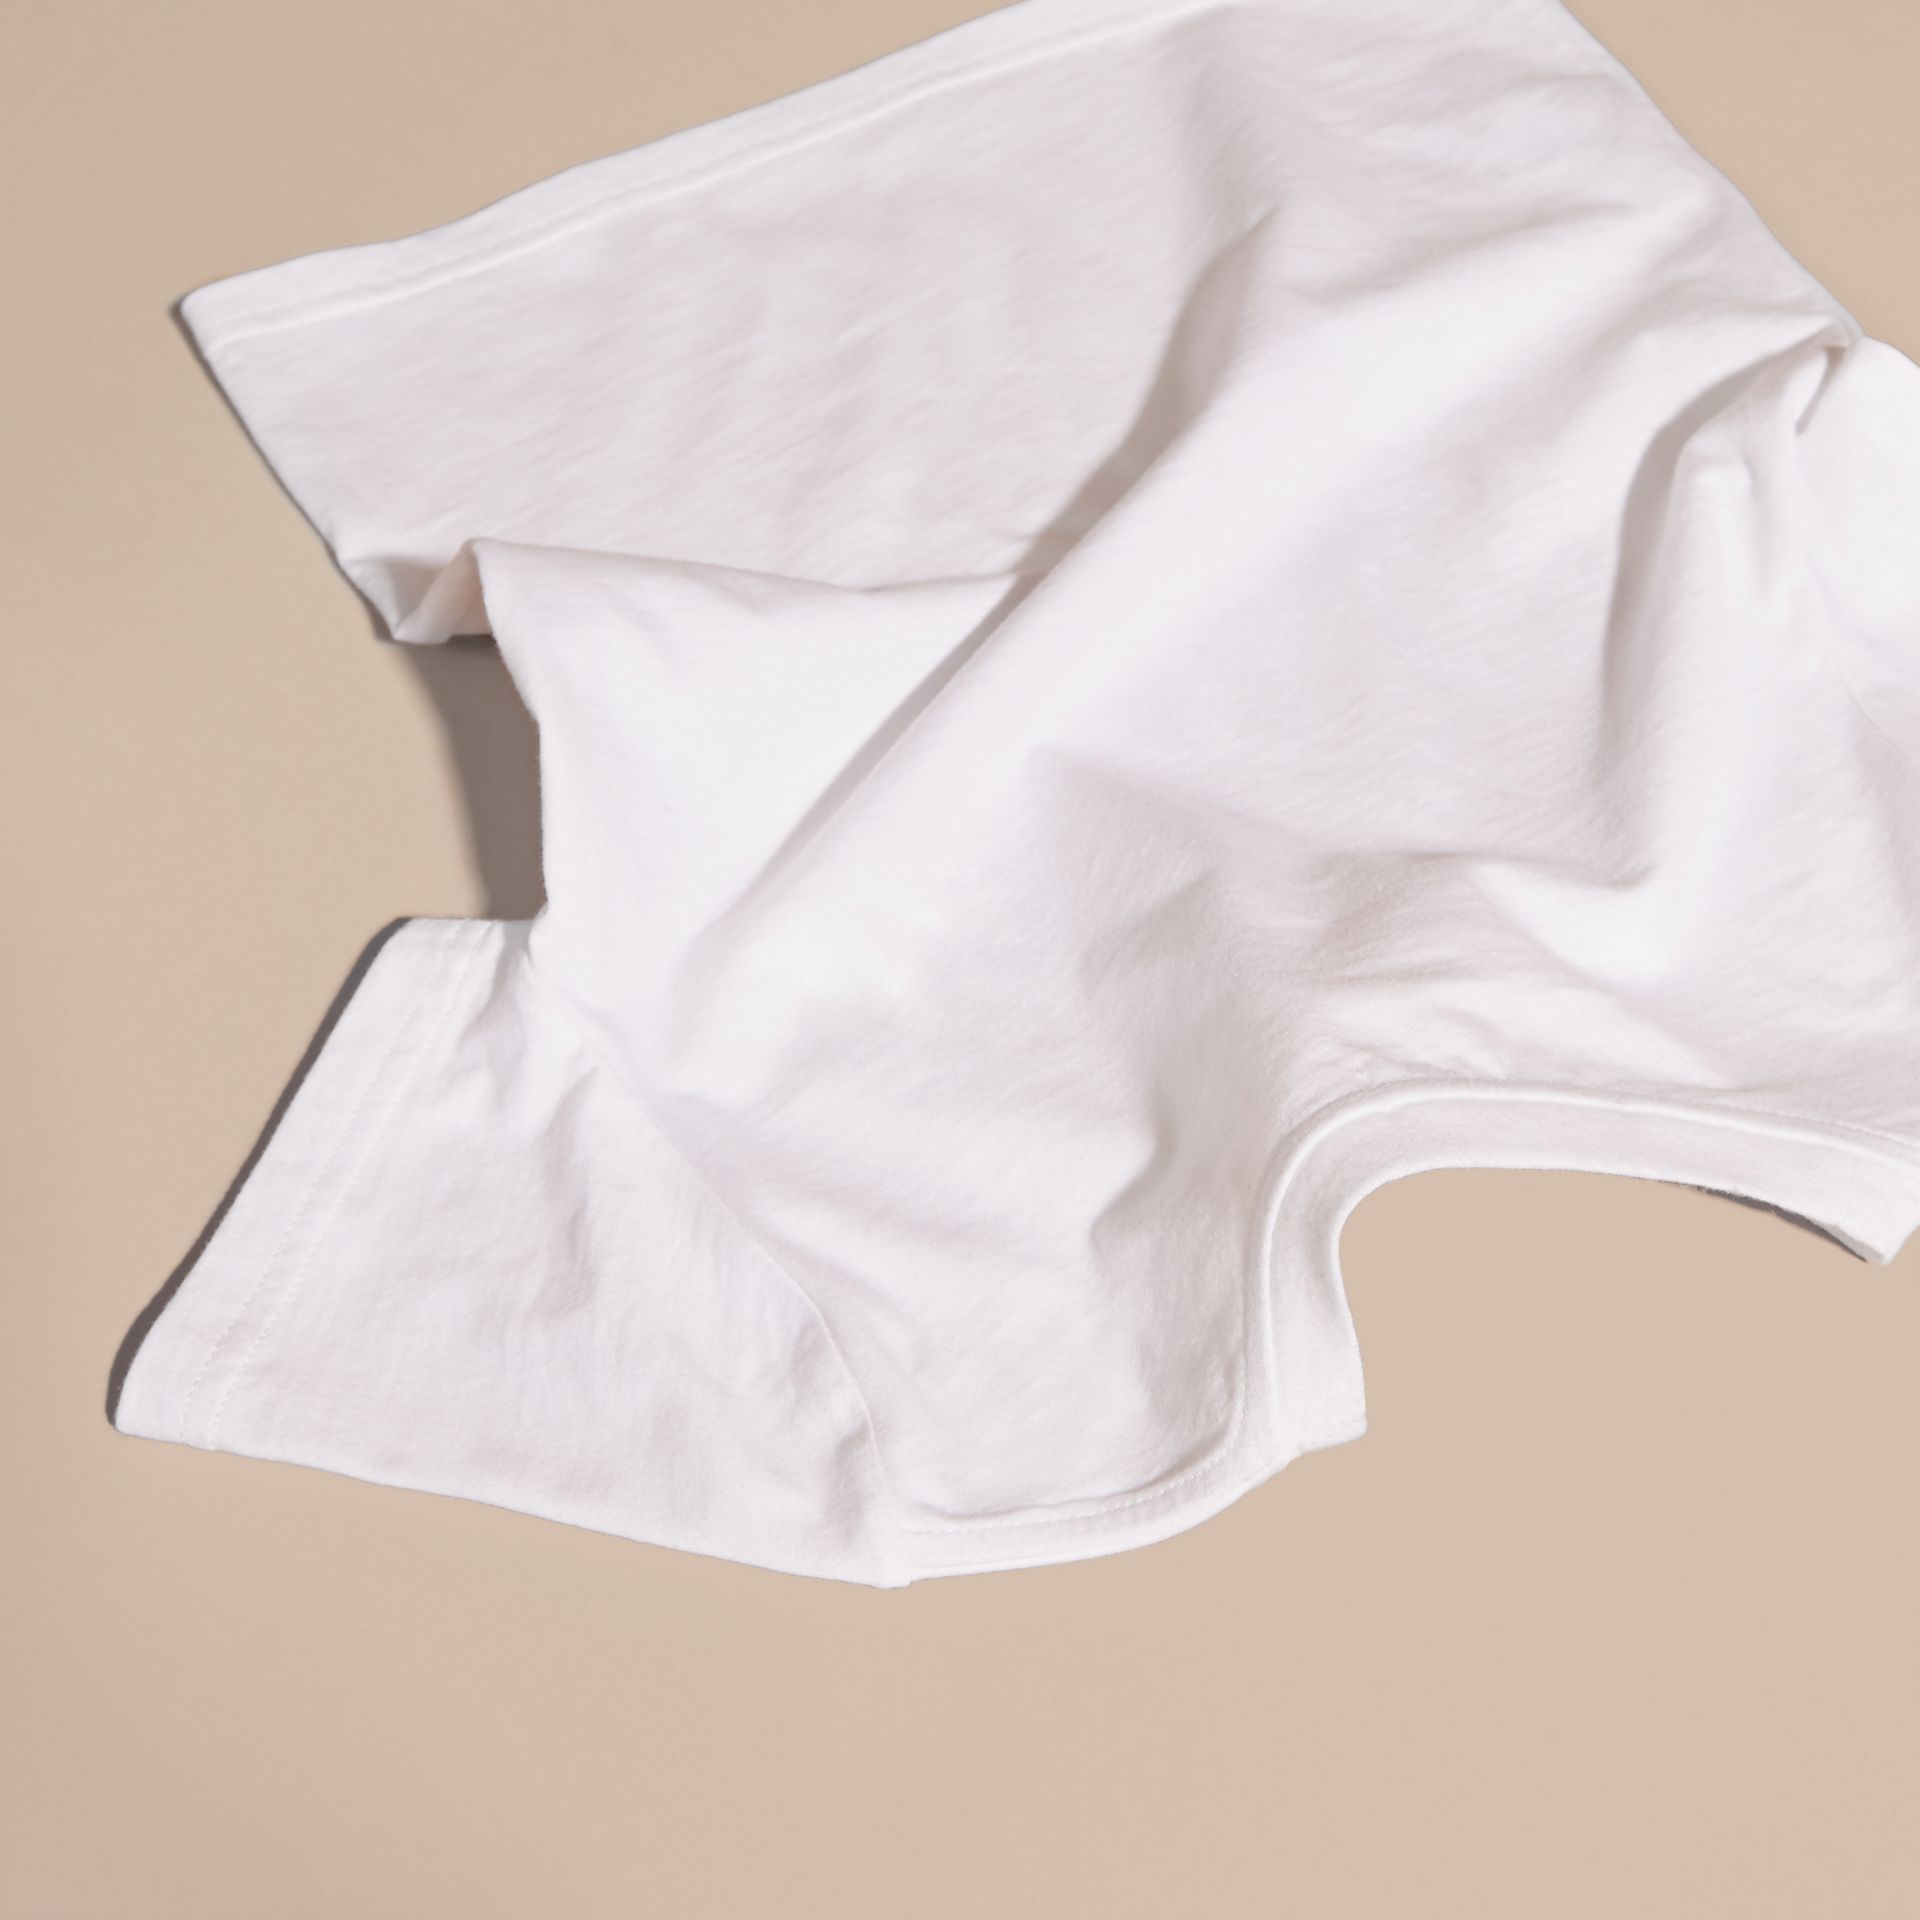 White Heart Print Cotton T-Shirt White - gallery image 4